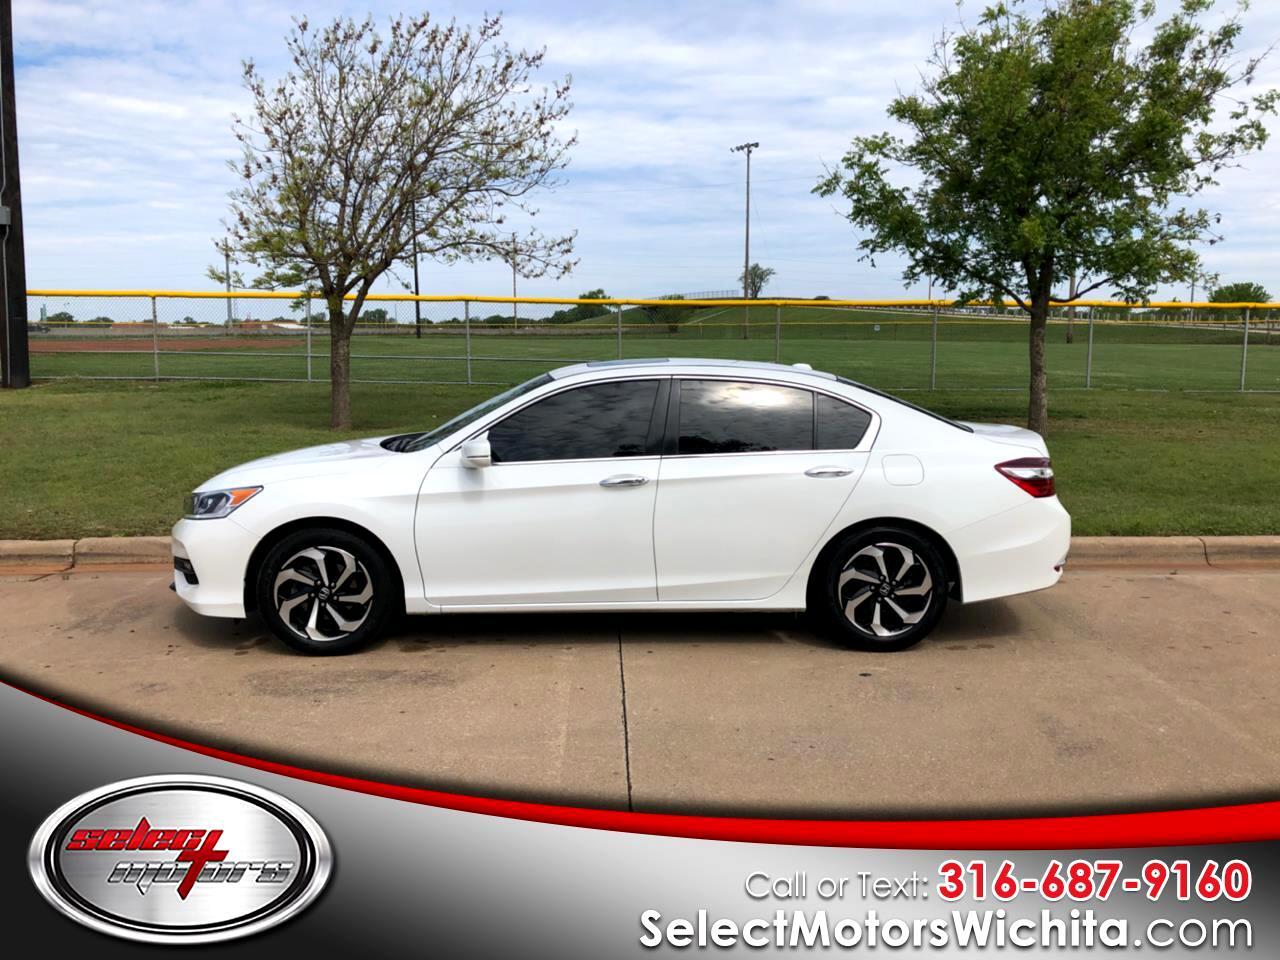 2016 Honda Accord Sedan 4dr I4 CVT EX-L